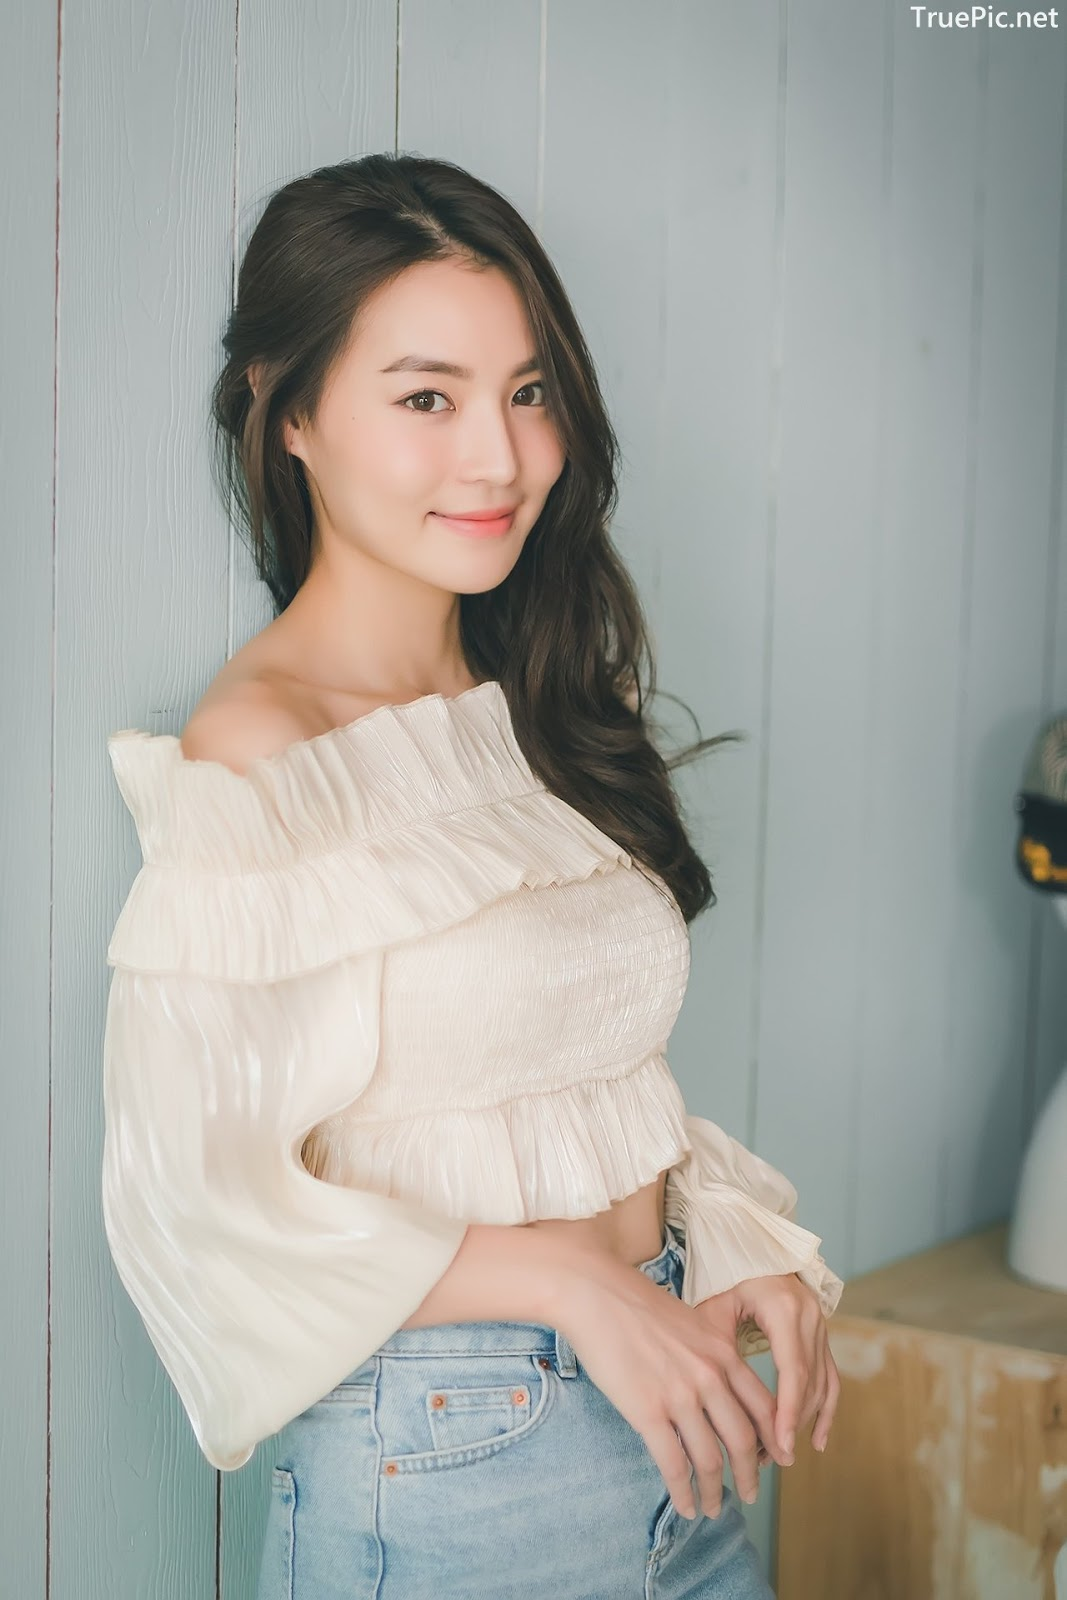 Image-Thailand-Beautiful-Model-Kapook-Phatchara-Concept-Lamoon-Indoor-TruePic.net- Picture-4